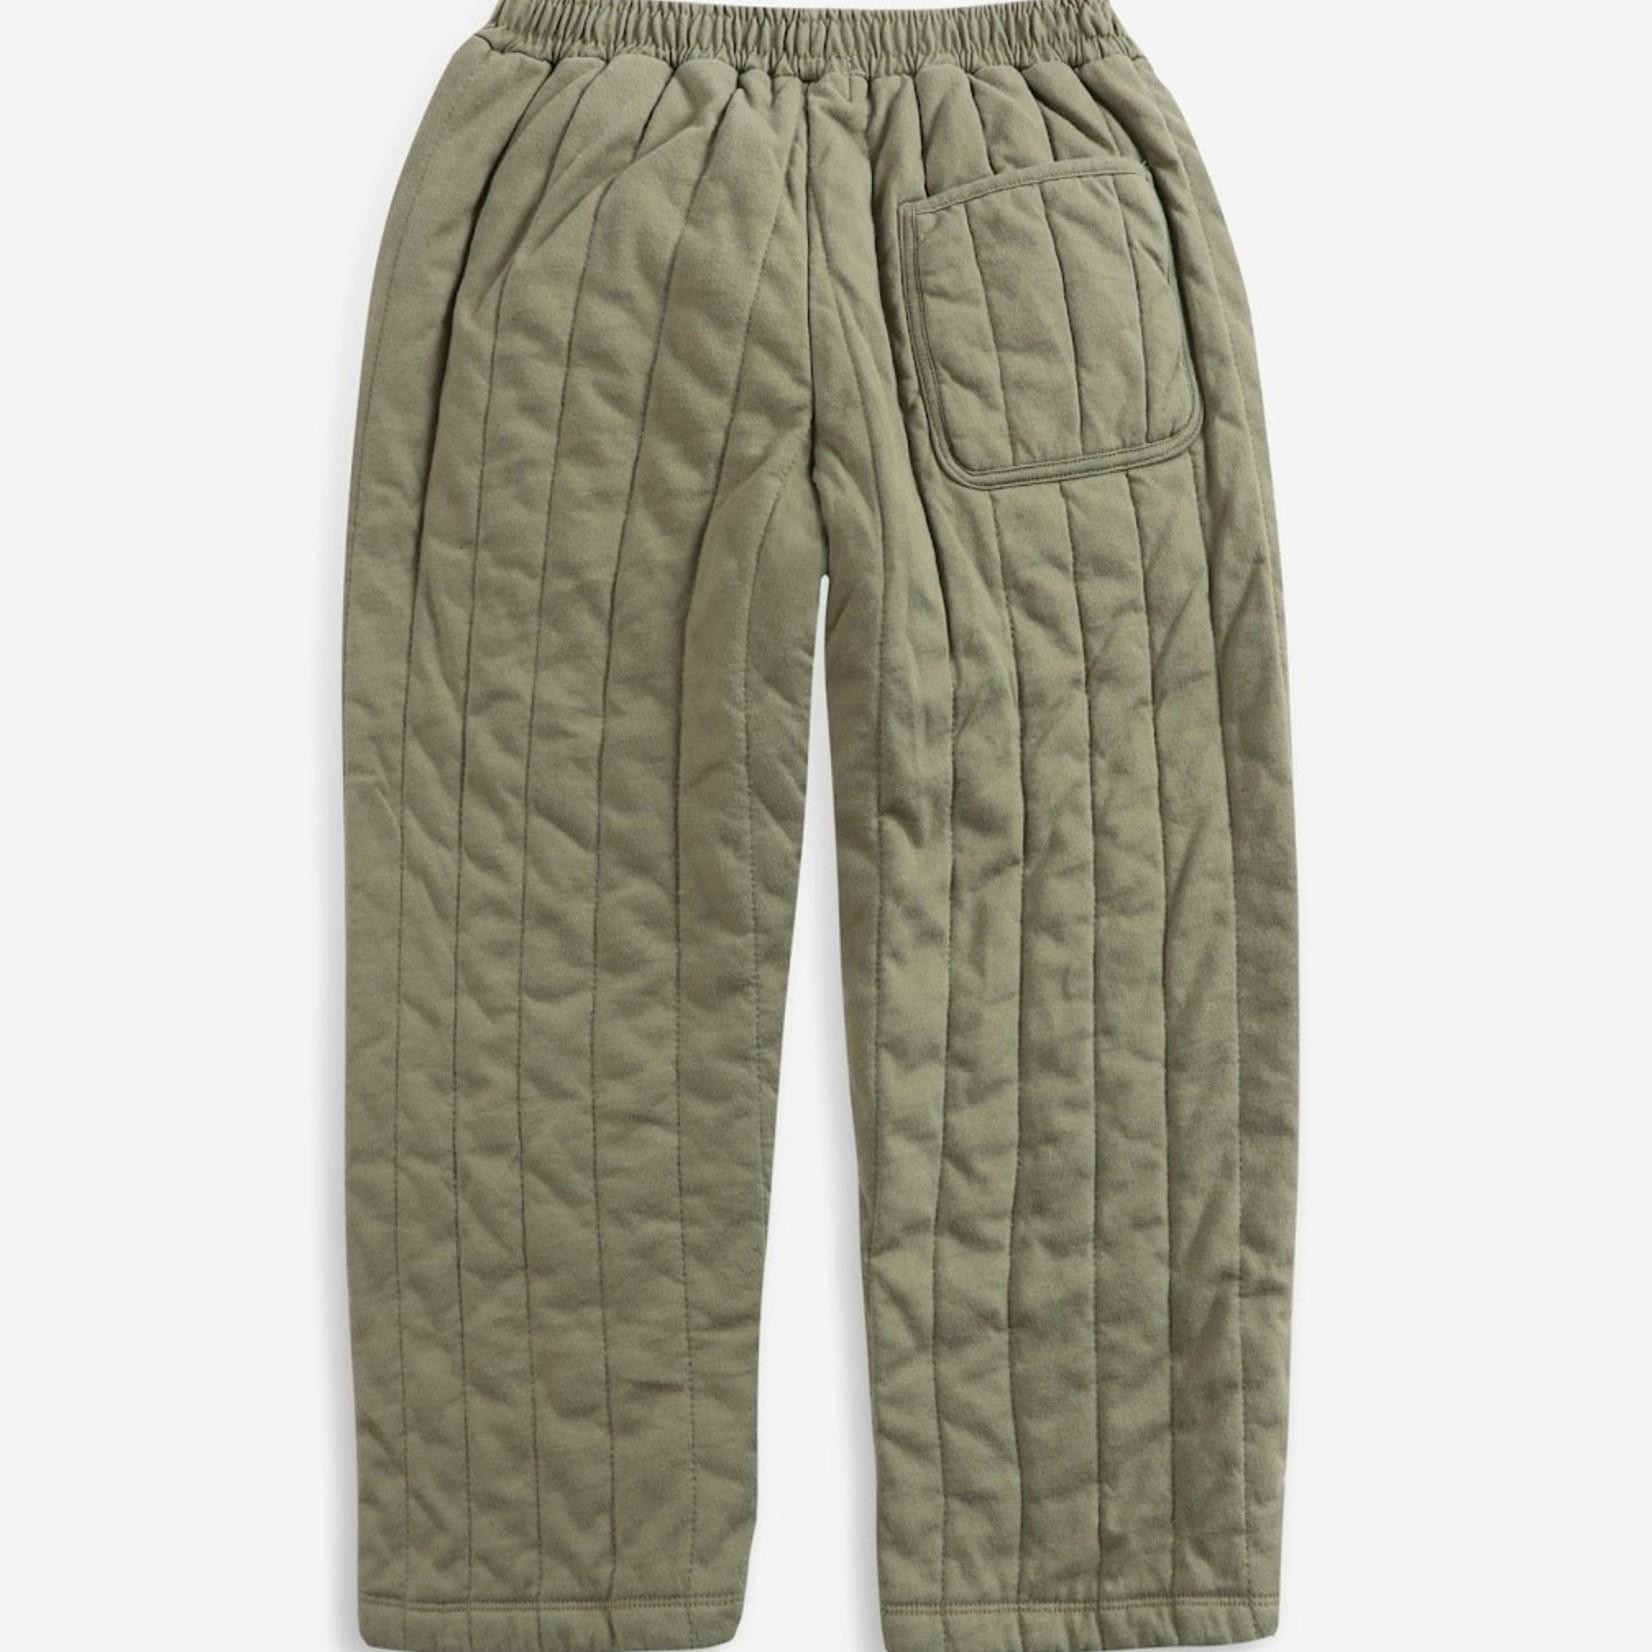 BOBO CHOSES BOBO CHOSES  quilted  jogging pants